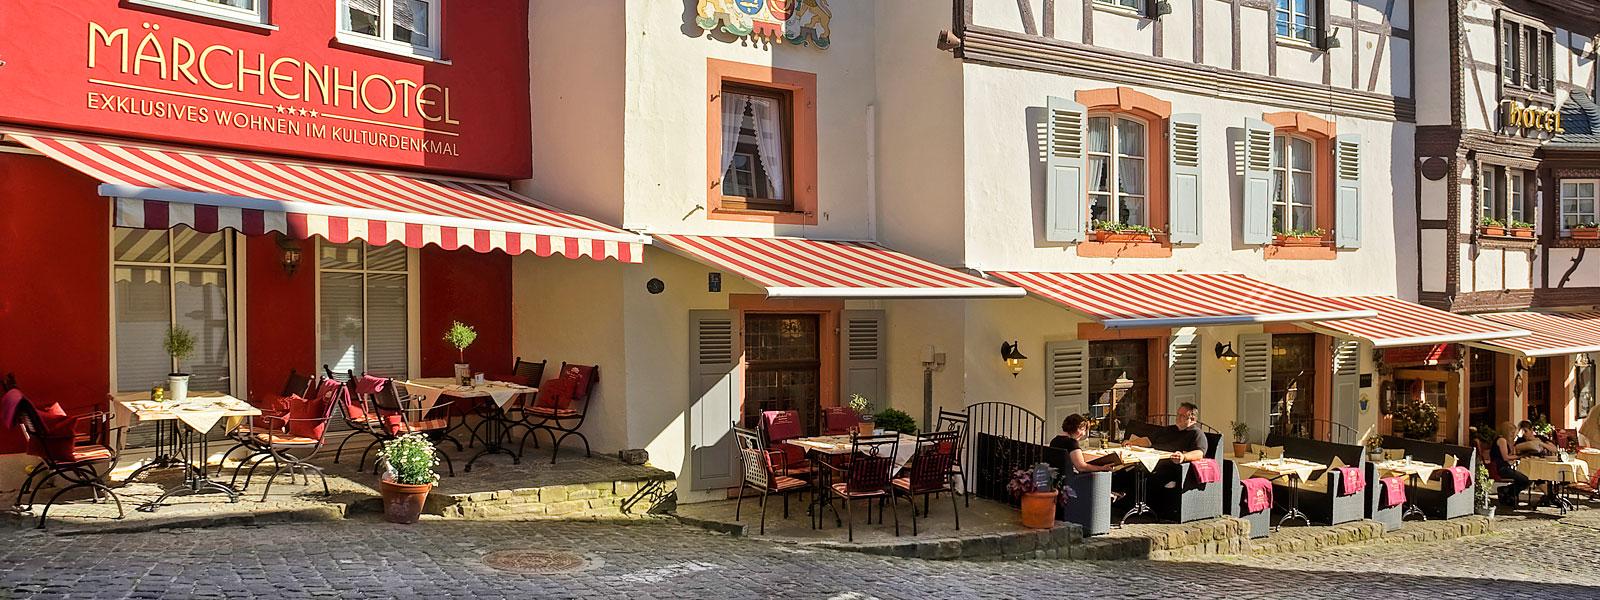 Restaurant Bernkastel-Kues